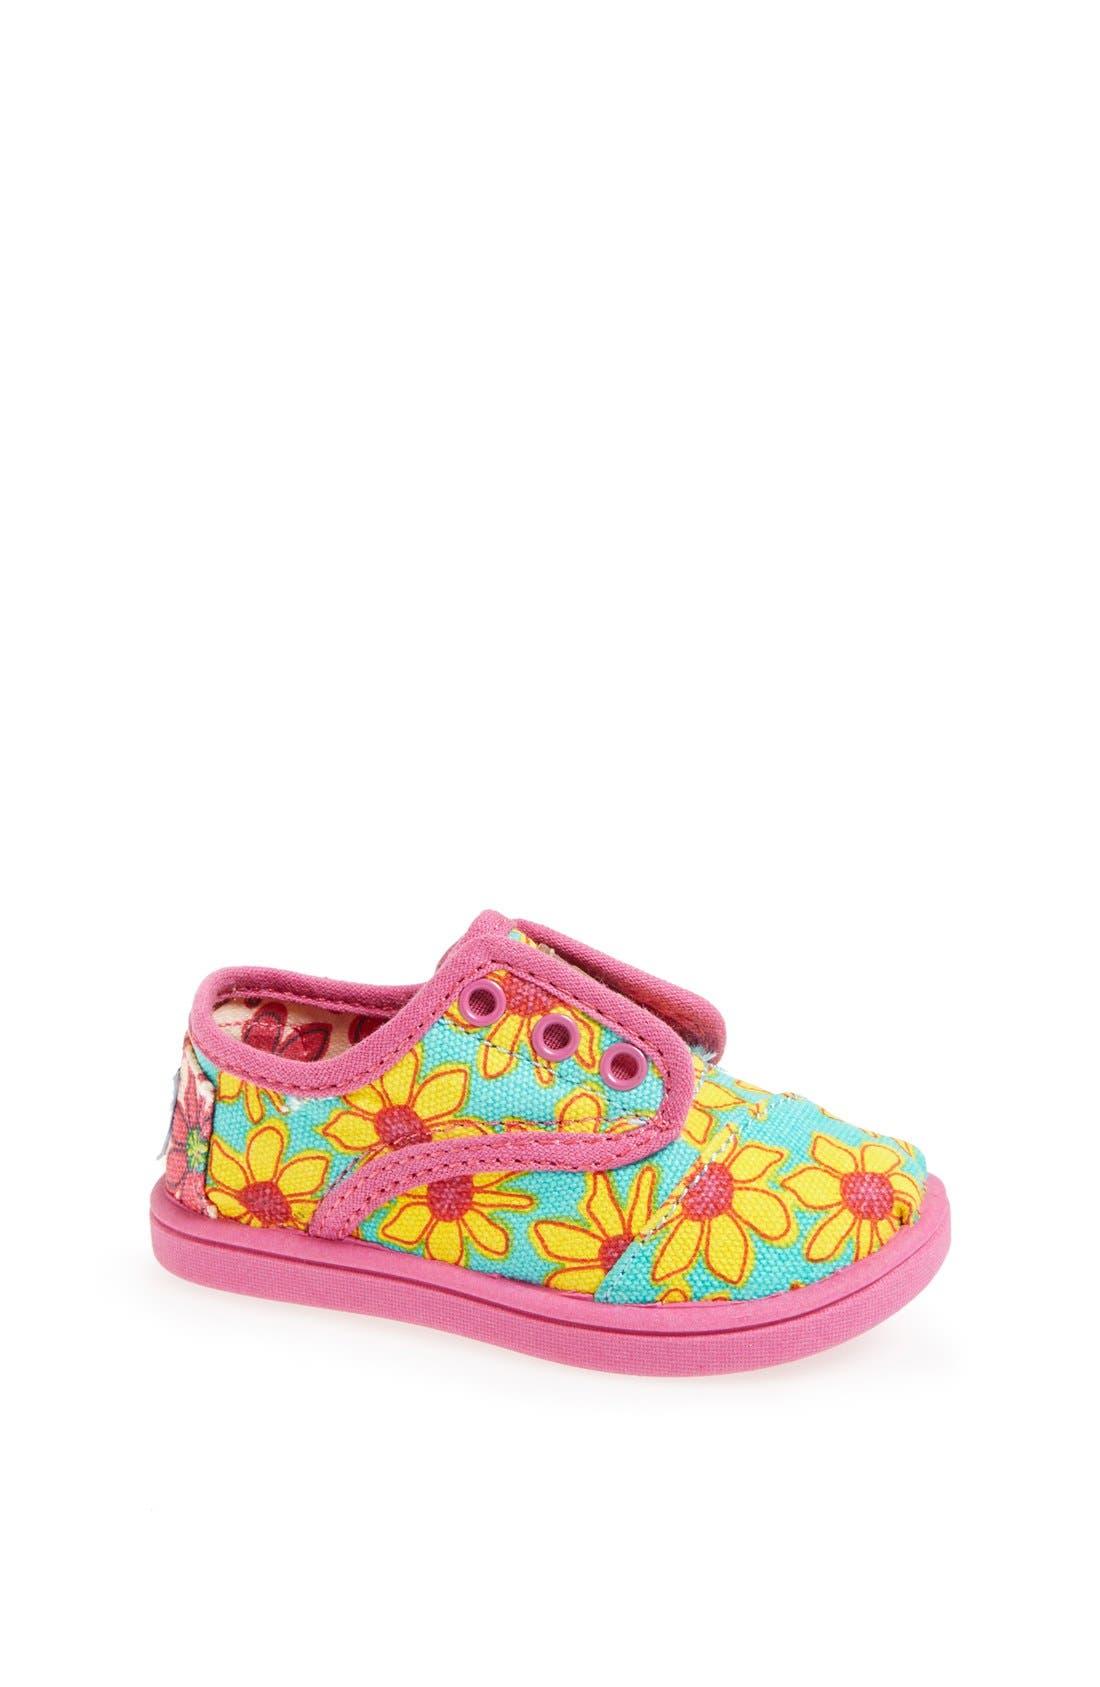 Alternate Image 1 Selected - TOMS 'Cordones - Tiny' Slip-On Sneaker (Baby, Walker & Toddler)